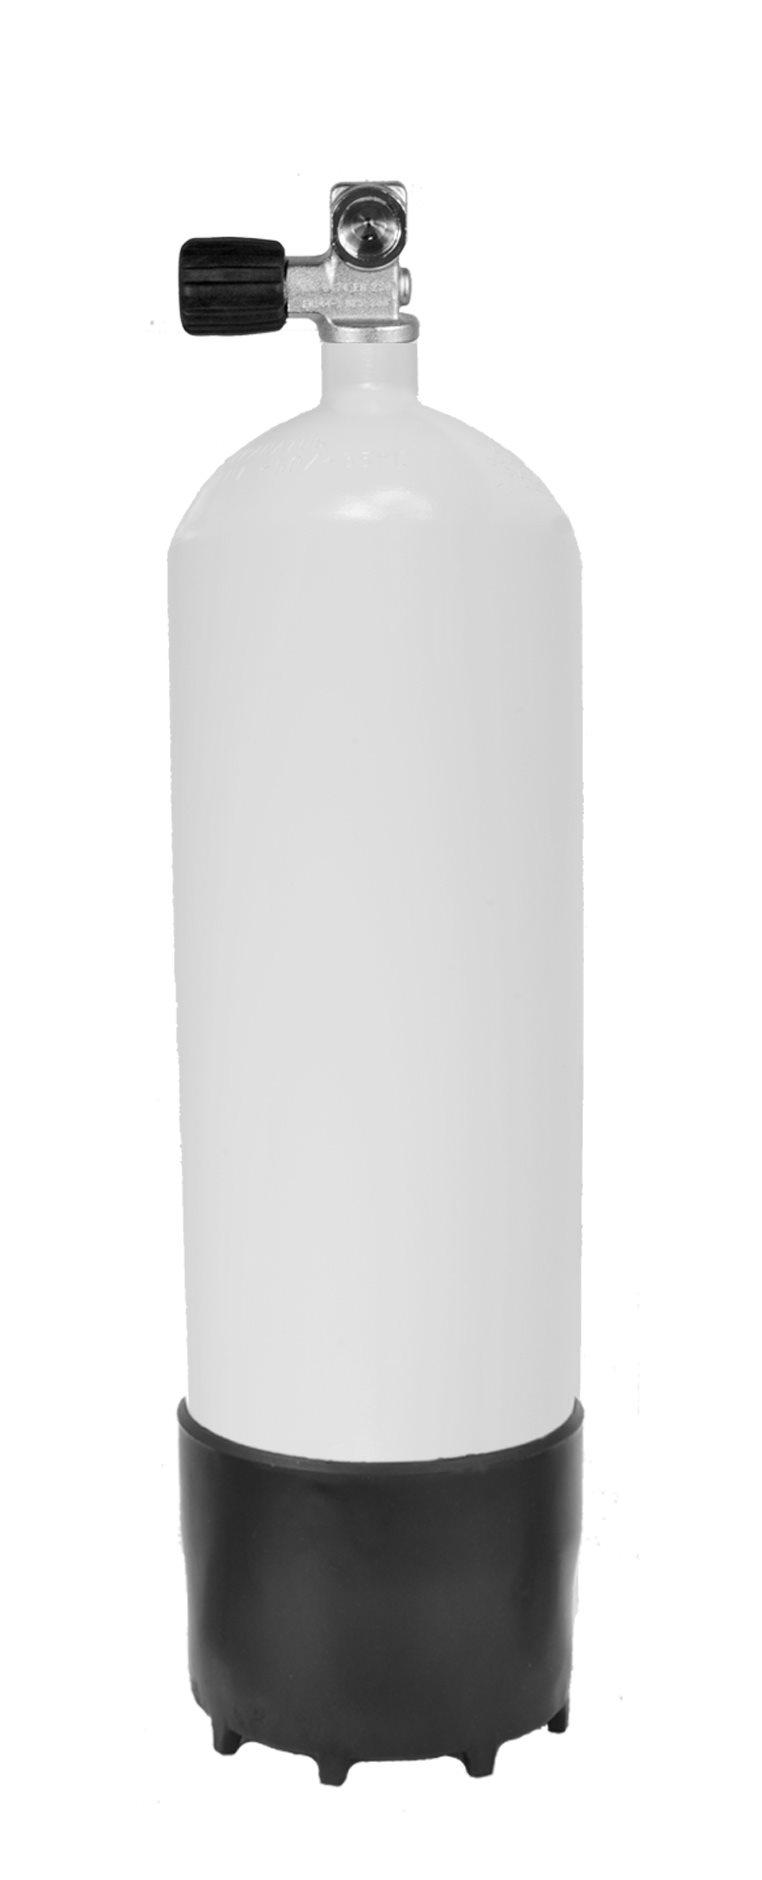 Водолазна бутилка 12 л / 300 бара - Eurocylinder